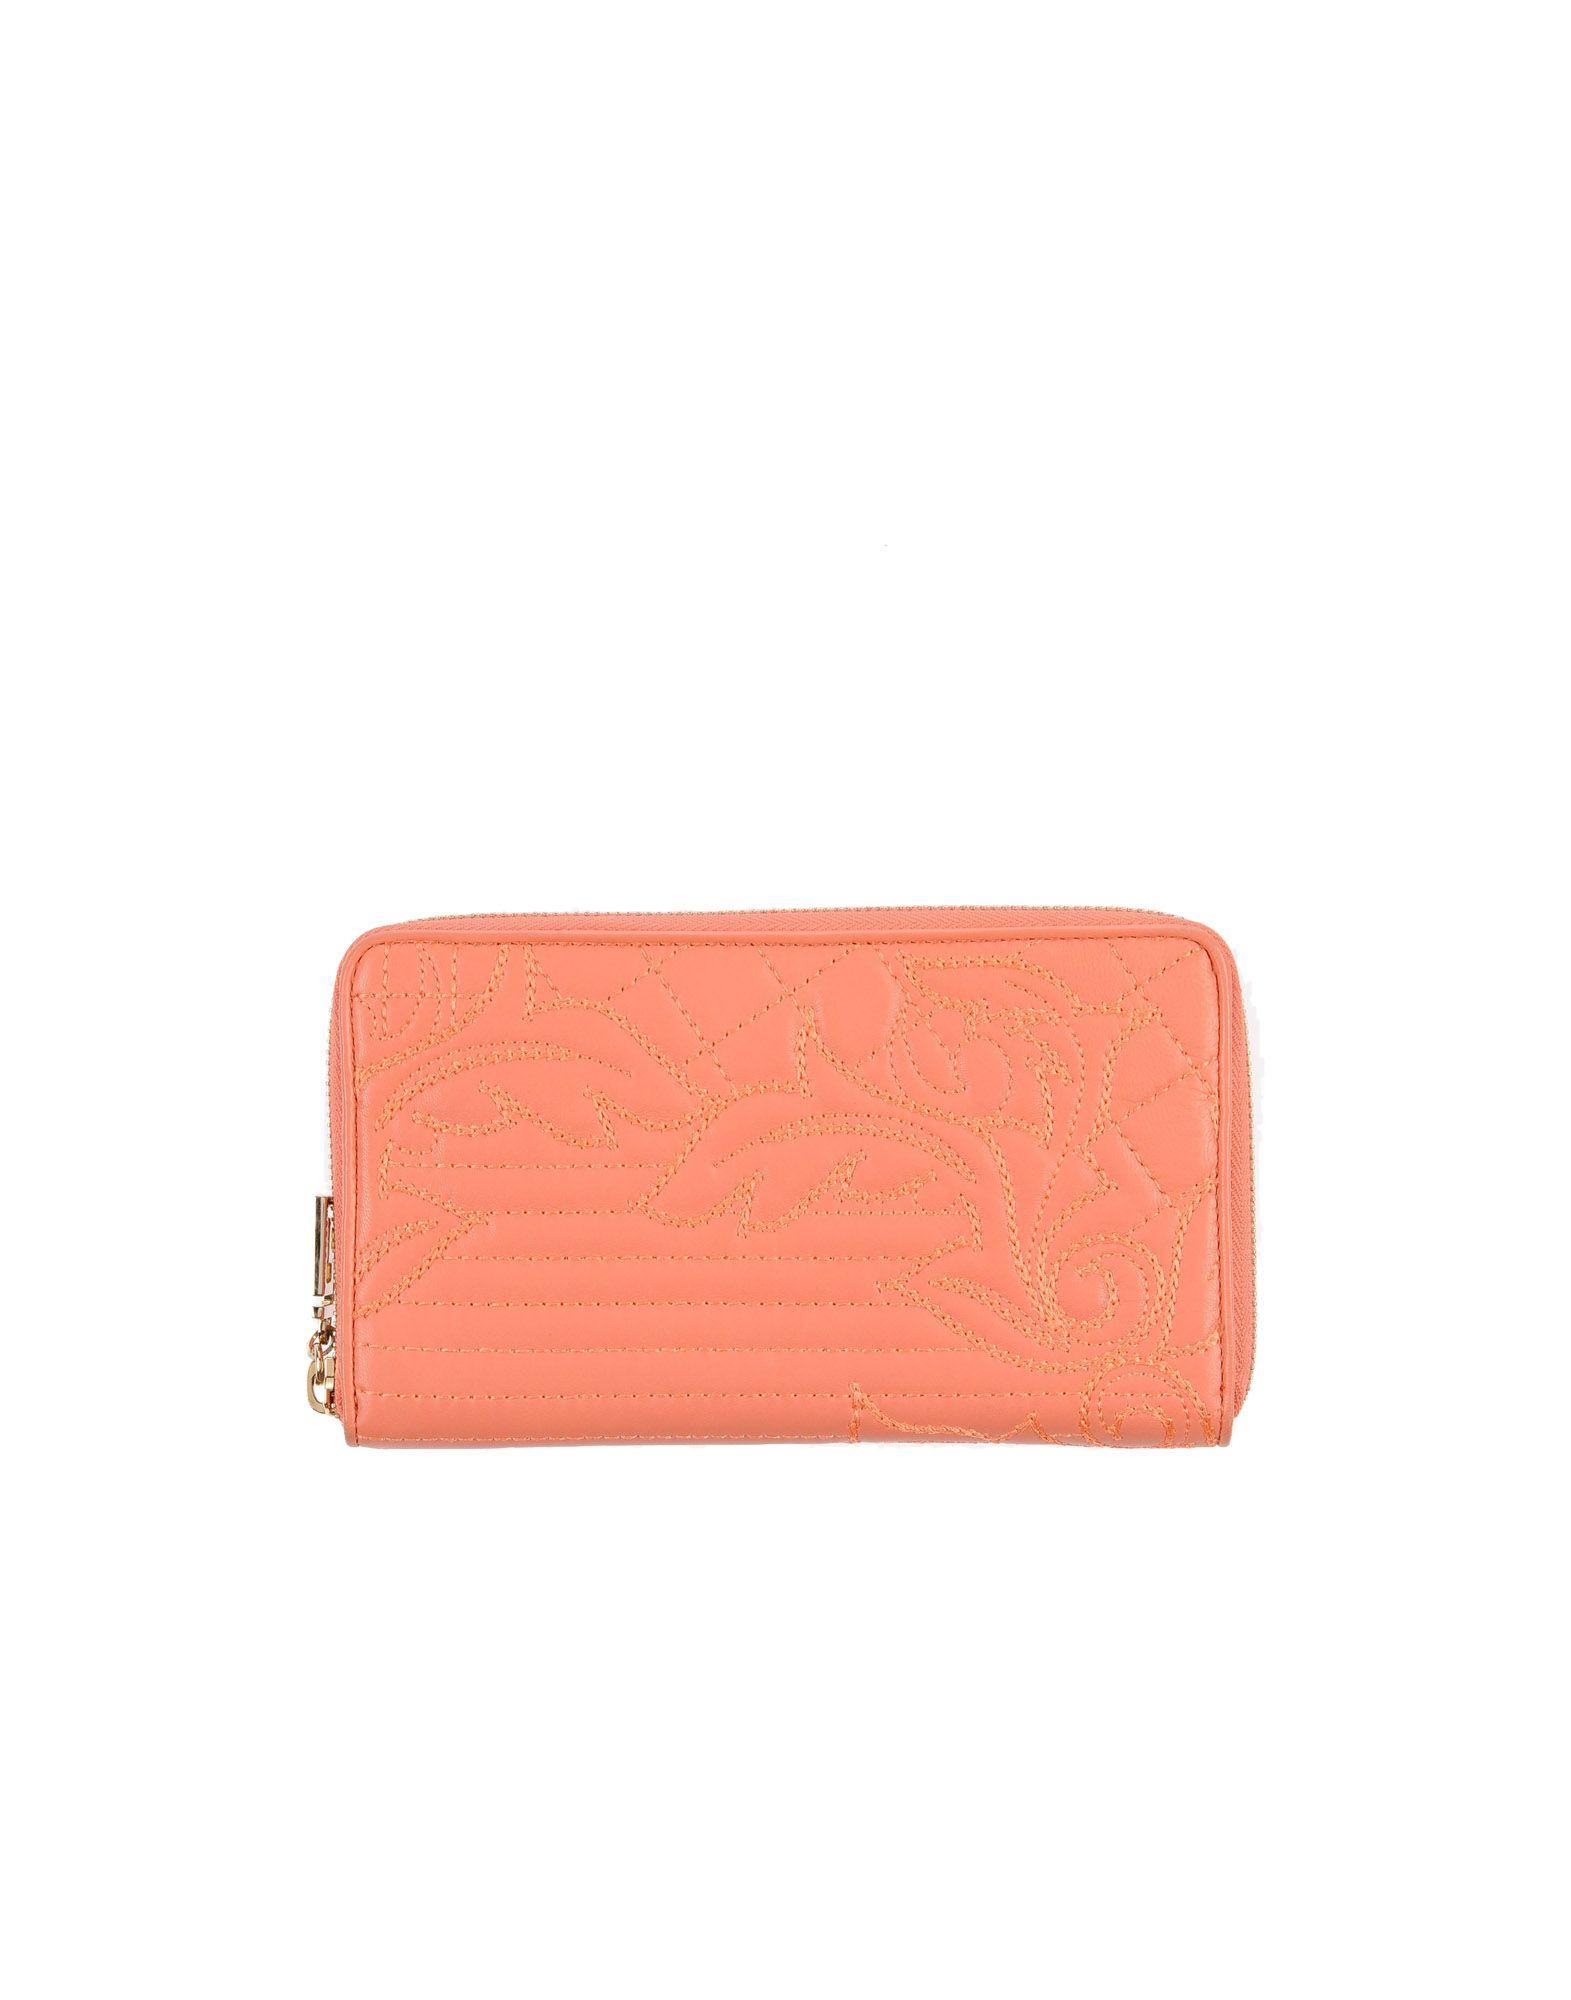 GIANNI VERSACE Wallet in Salmon Pink